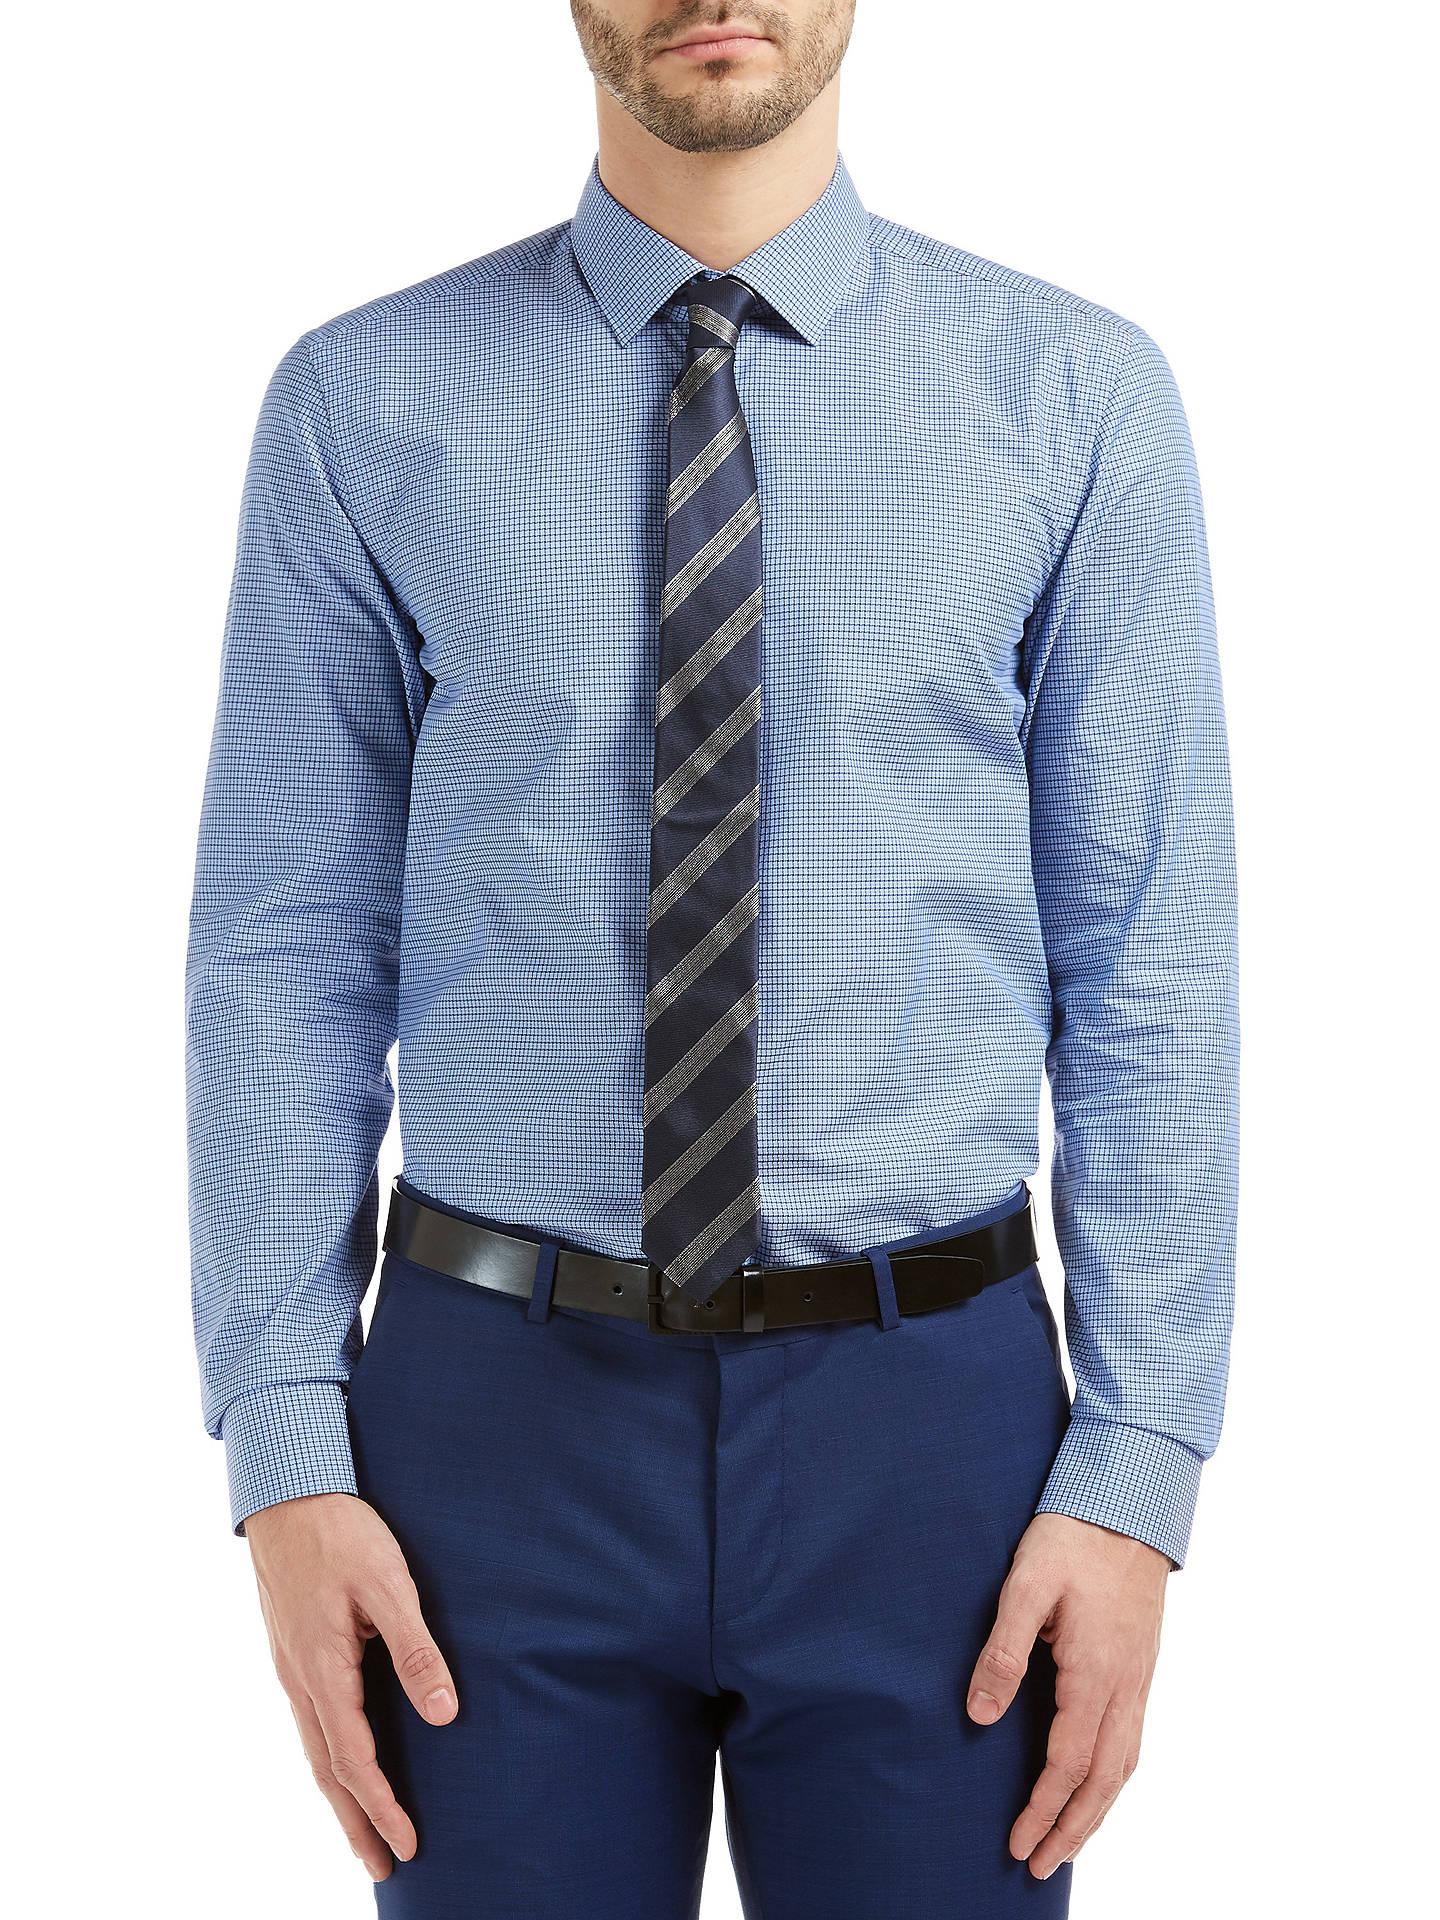 e037188f9 HUGO by Hugo Boss C-Jenno Slim Fit Shirt, Navy at John Lewis & Partners